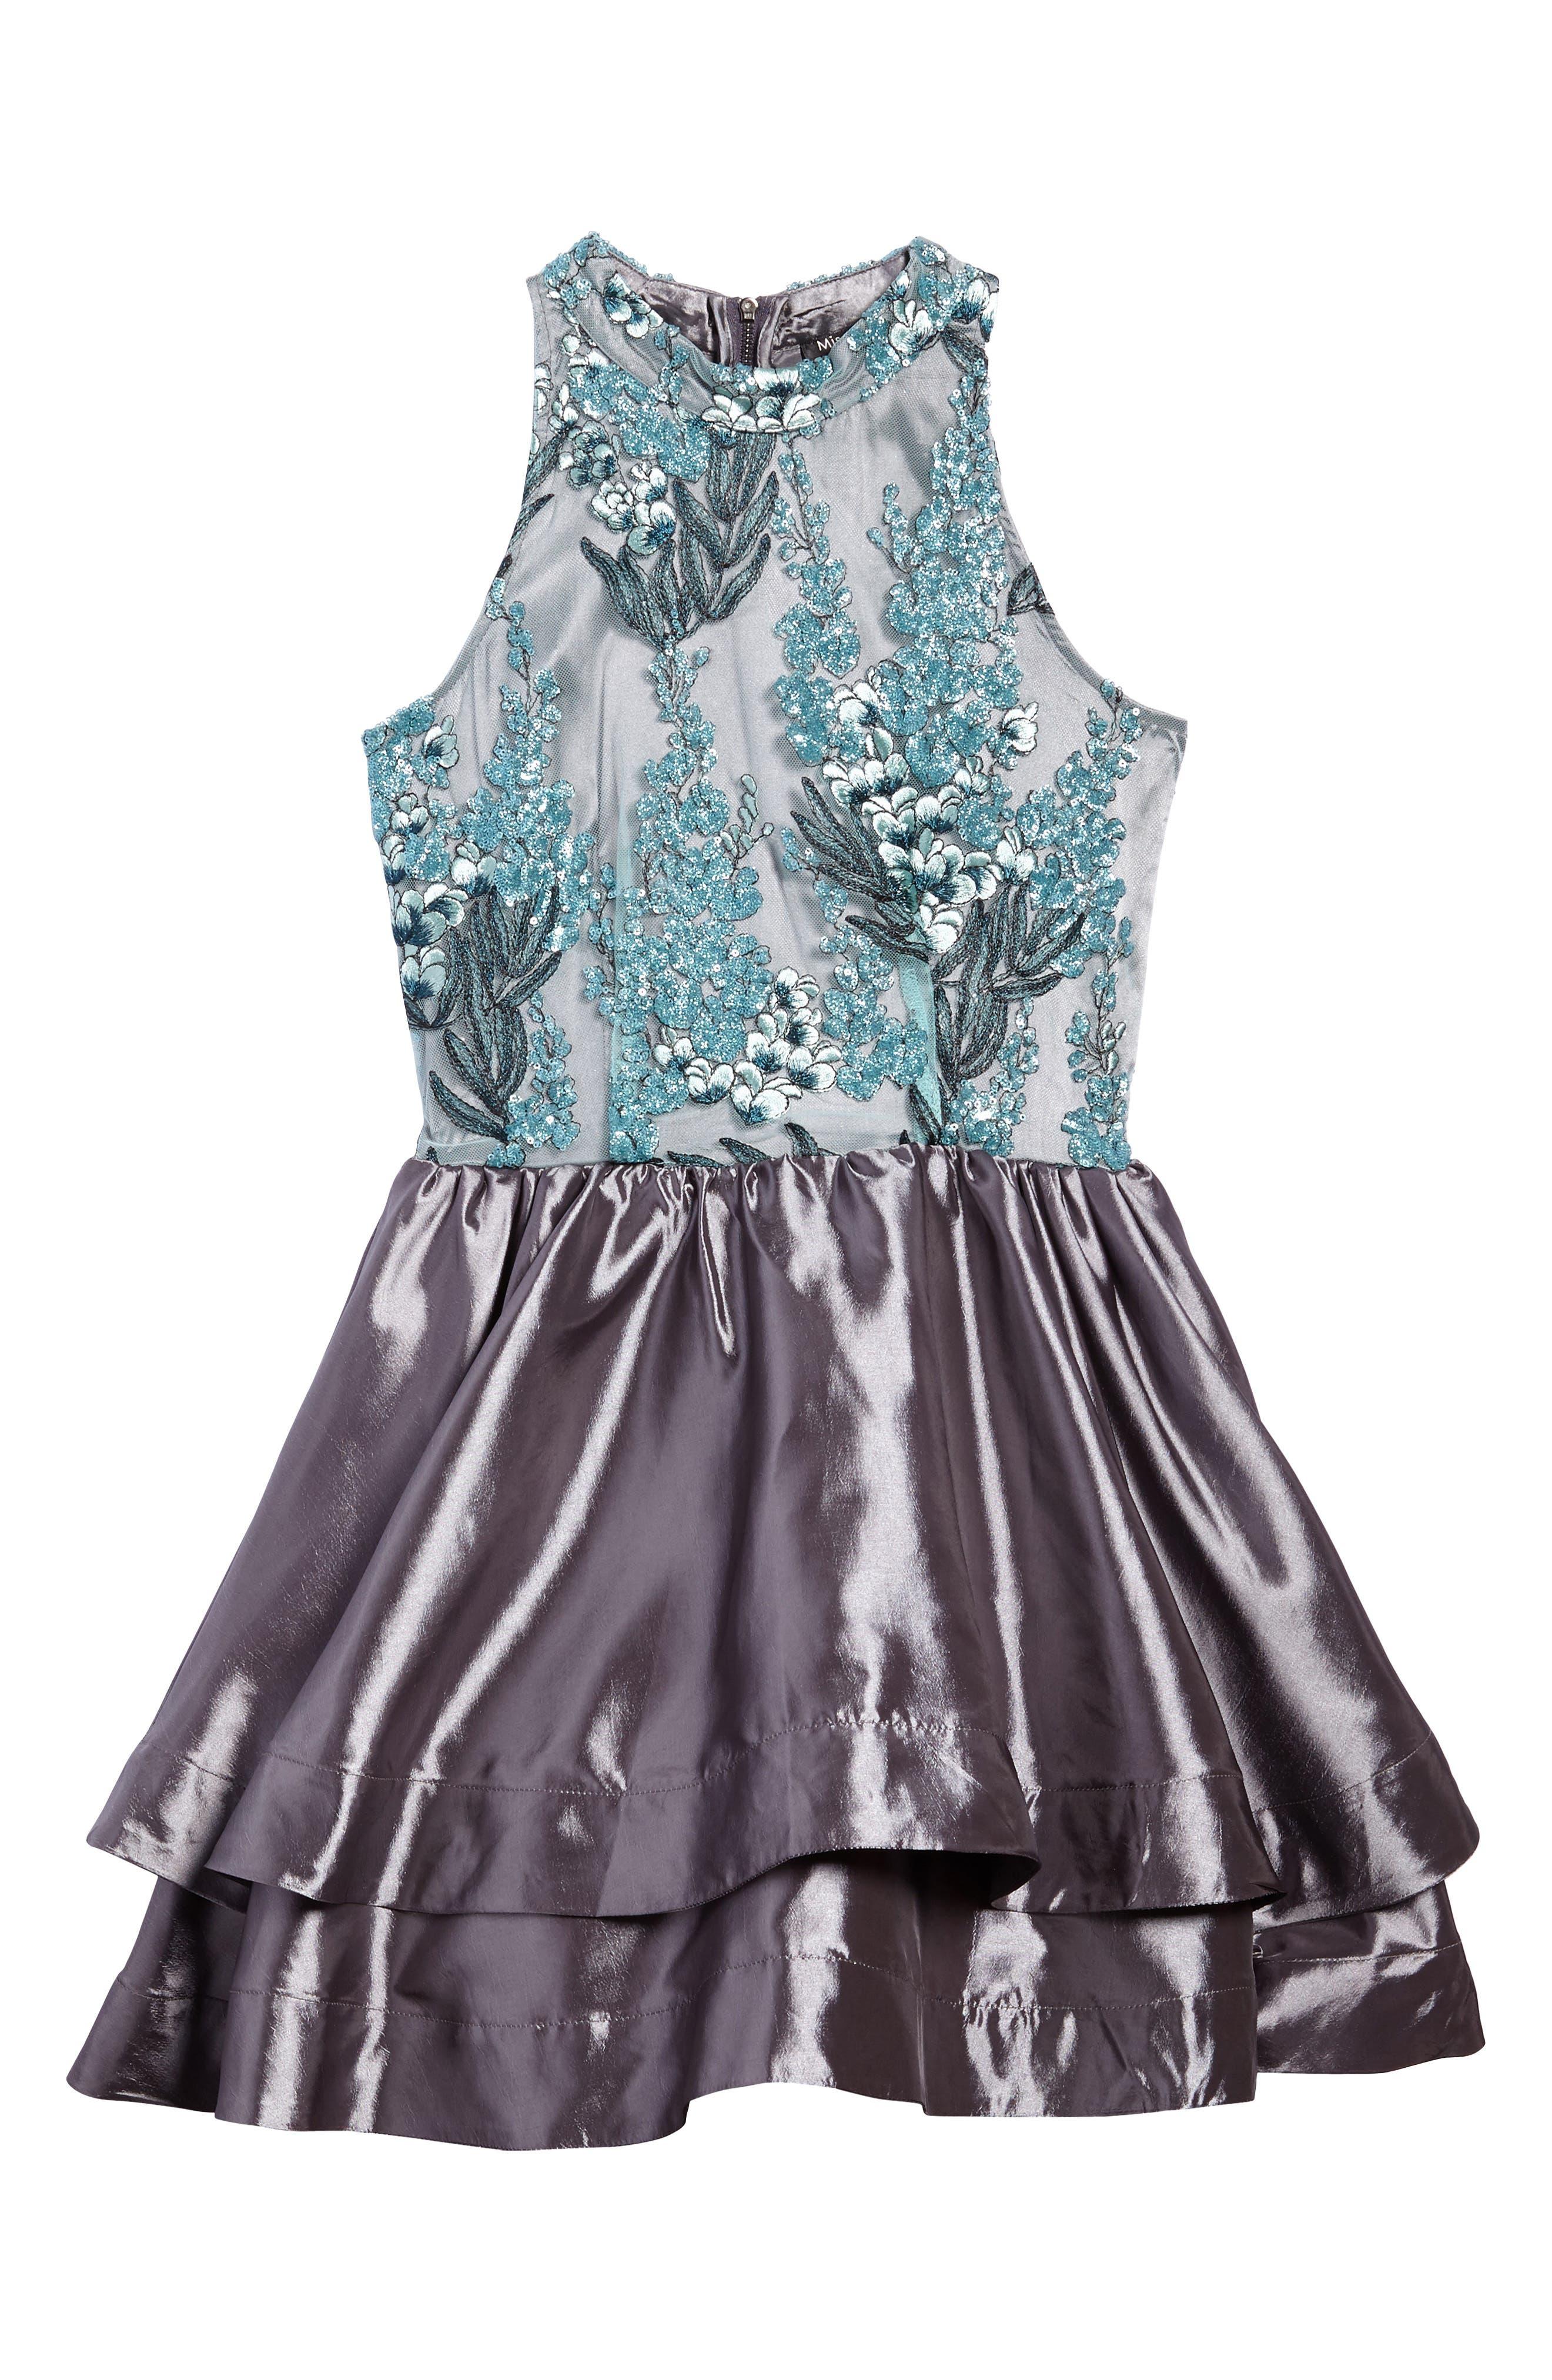 Main Image - Miss Behave Ruby Sequin Sleeveless Dress (Big Girls)